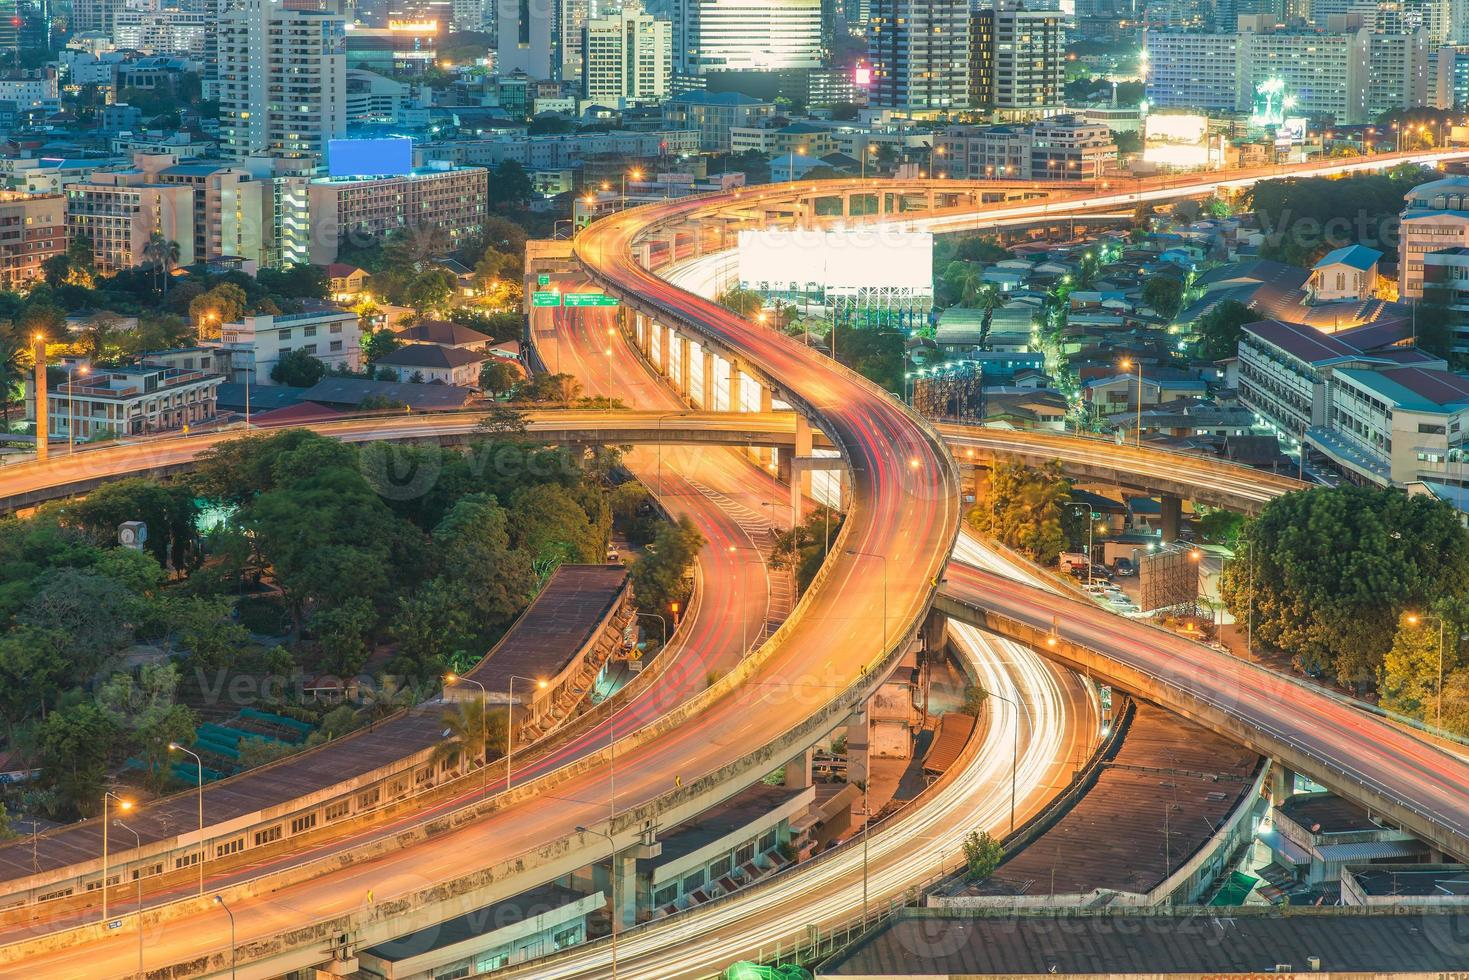 superstrada sopraelevata. la curva del ponte sospeso, Tailandia. foto